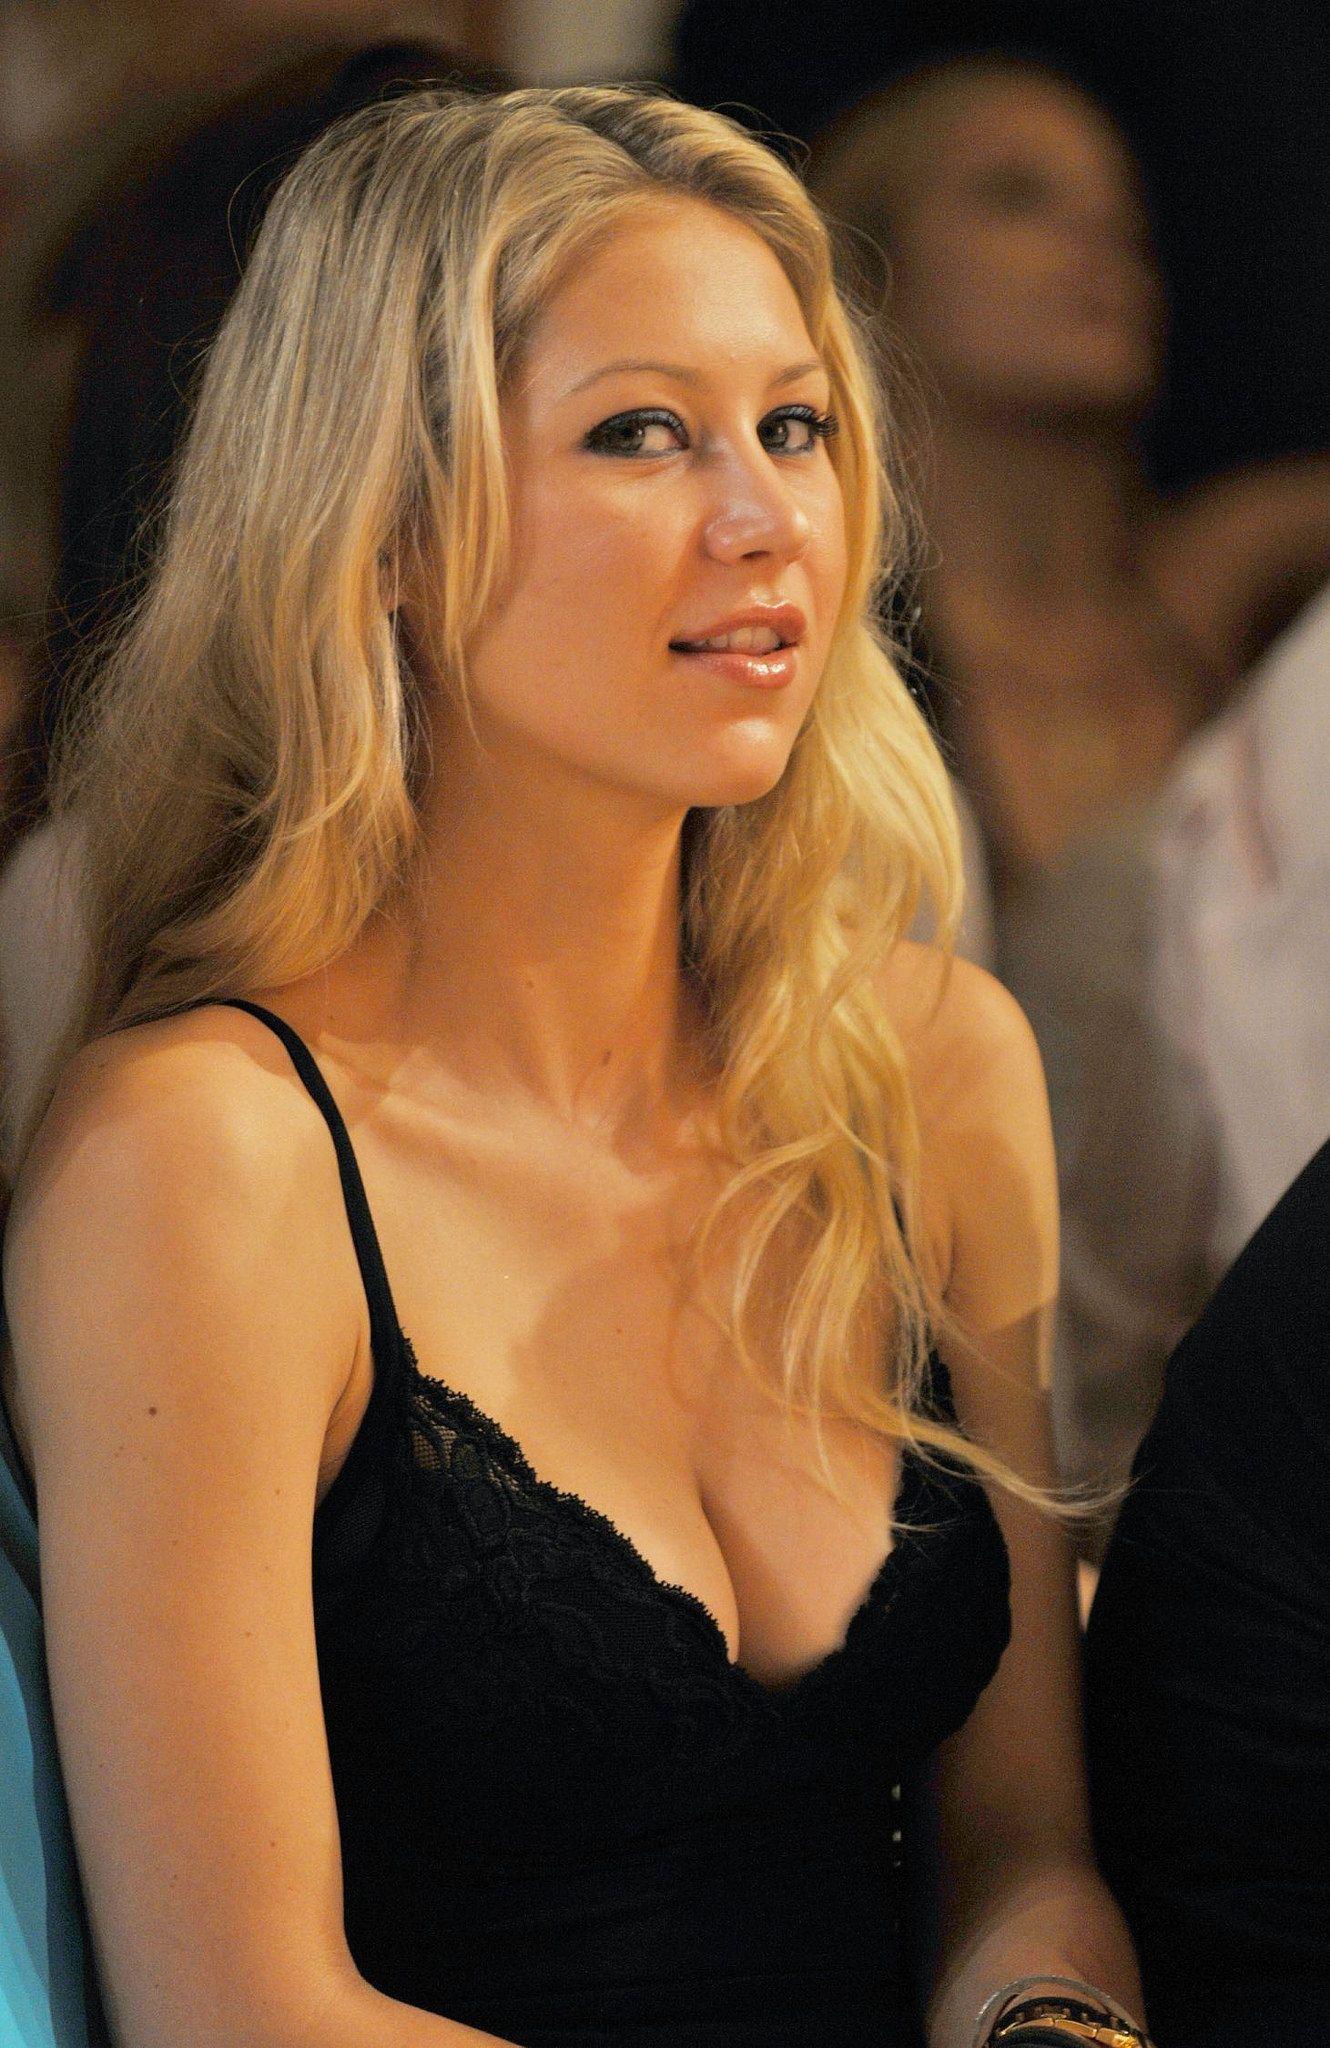 Hacked Anna Kournikova nude photos 2019